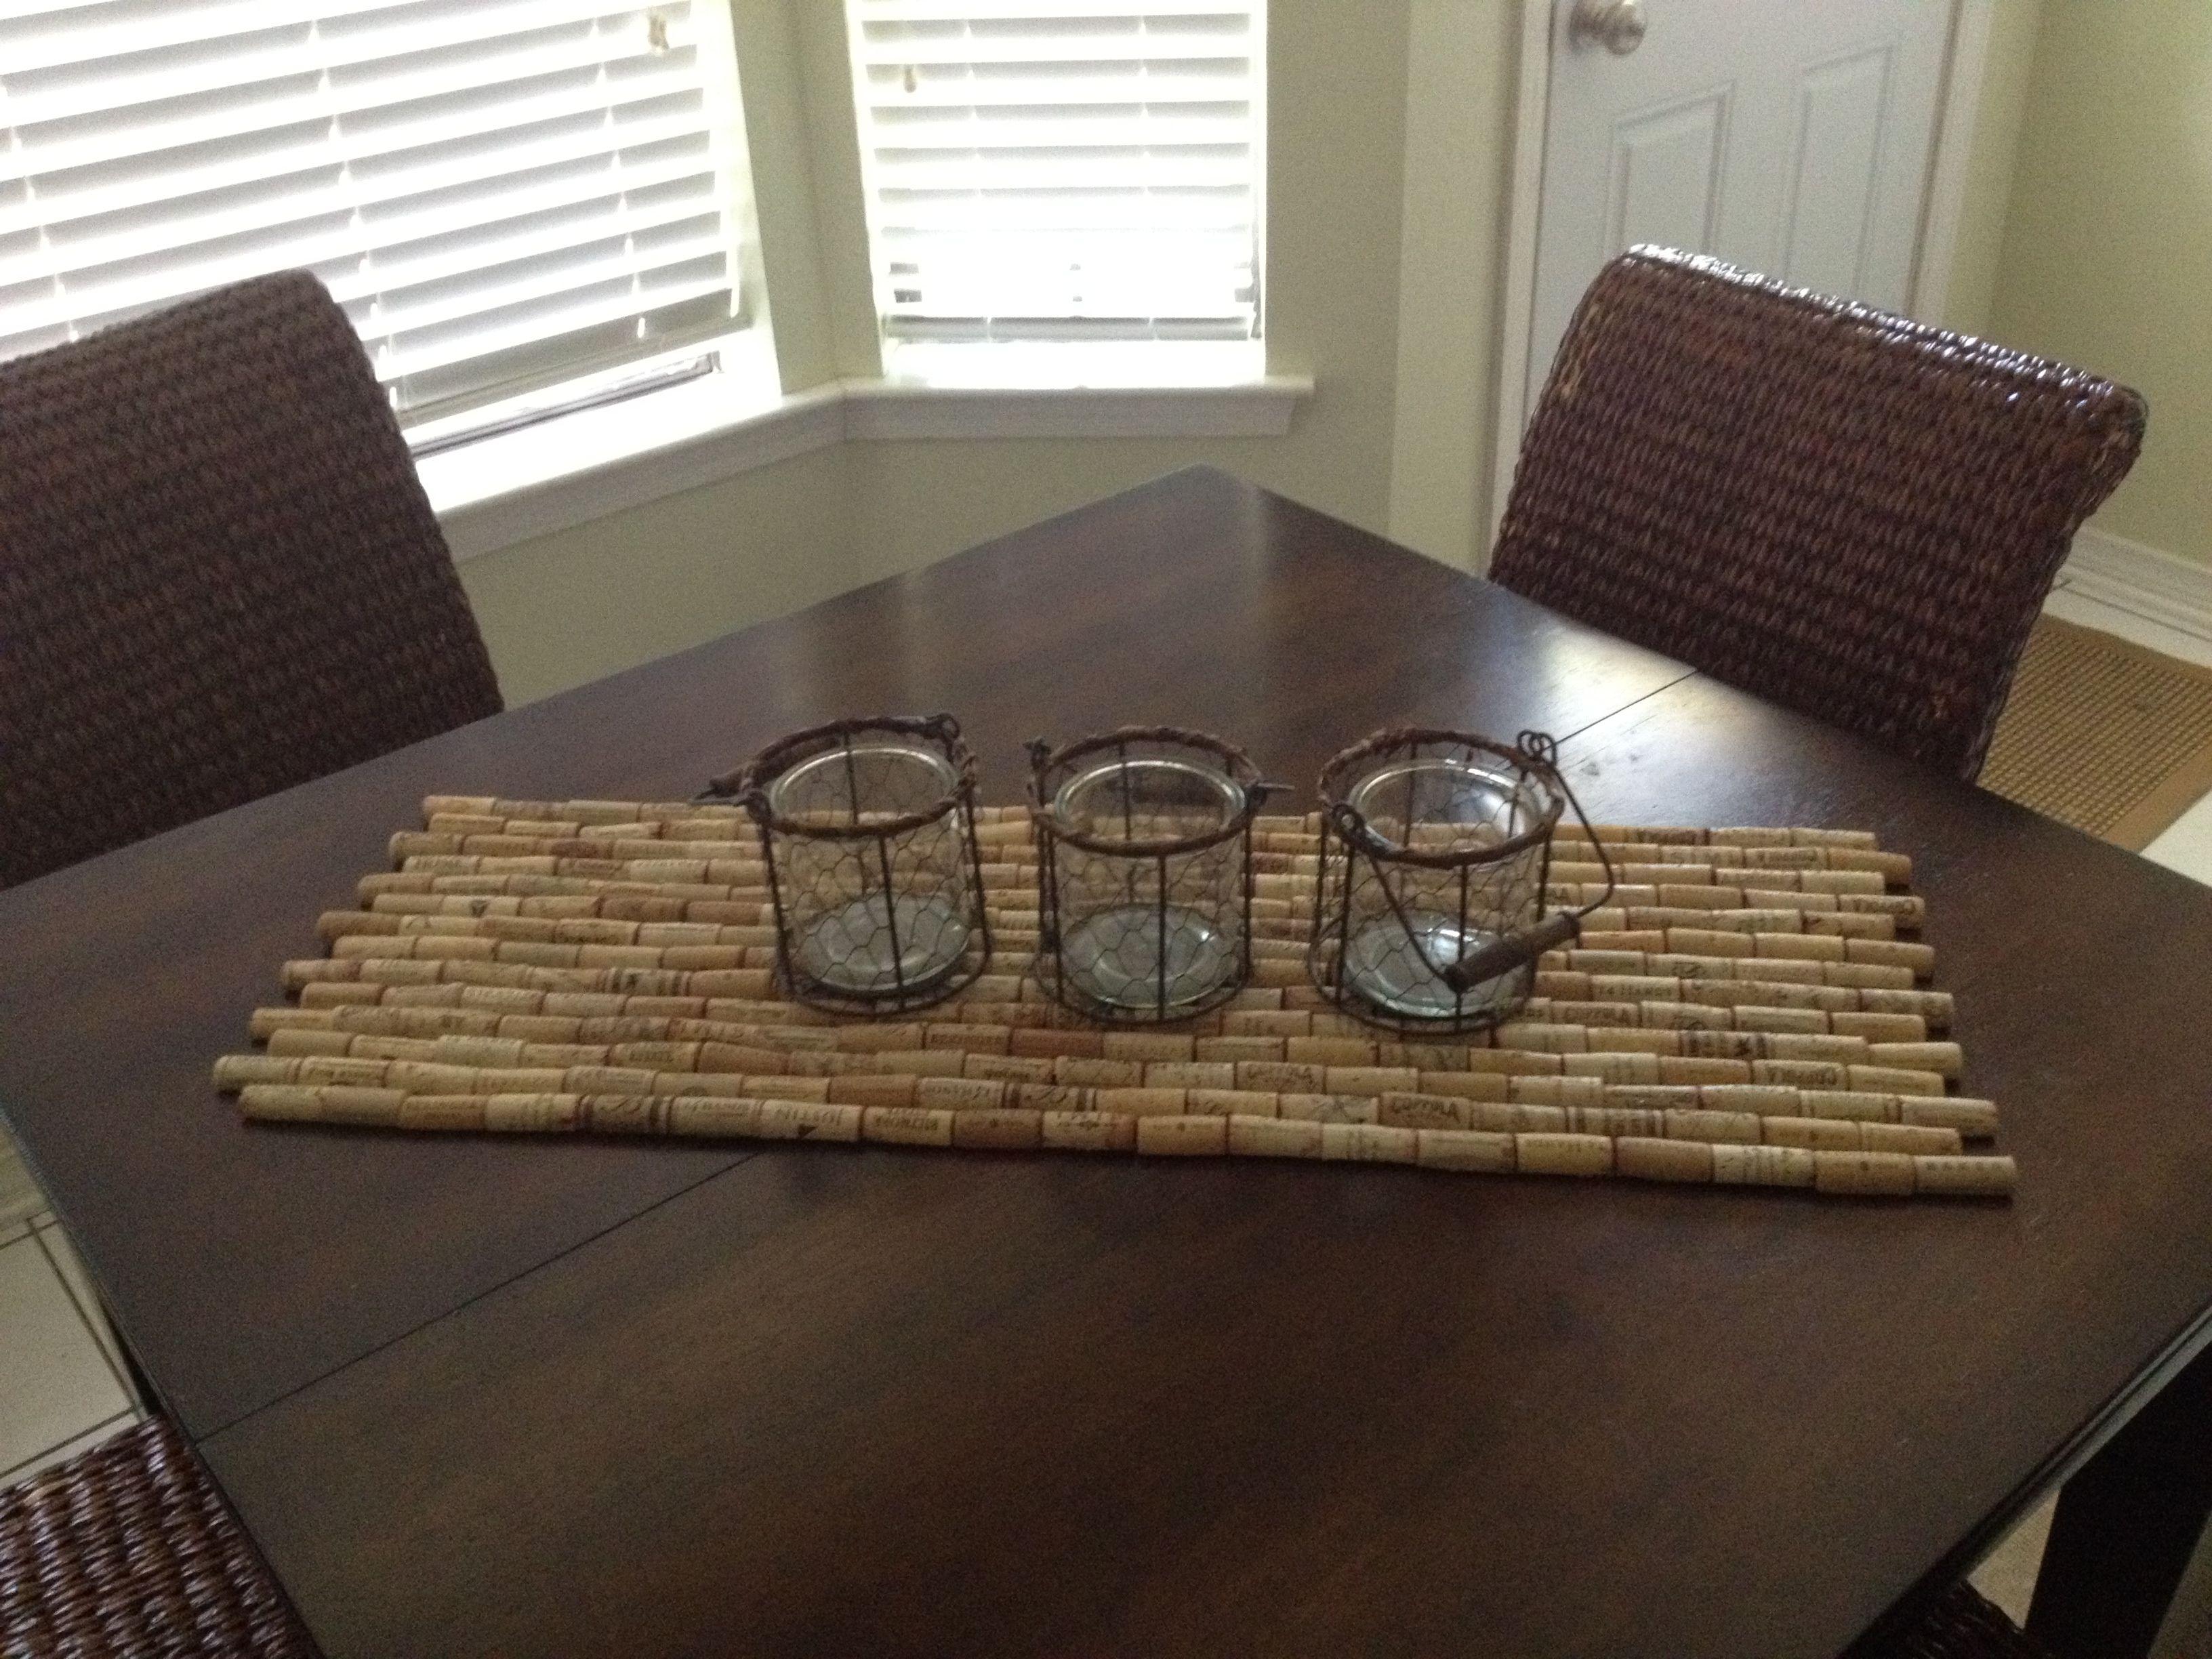 Wine bottle corks crafts - Wine Cork Table Runner